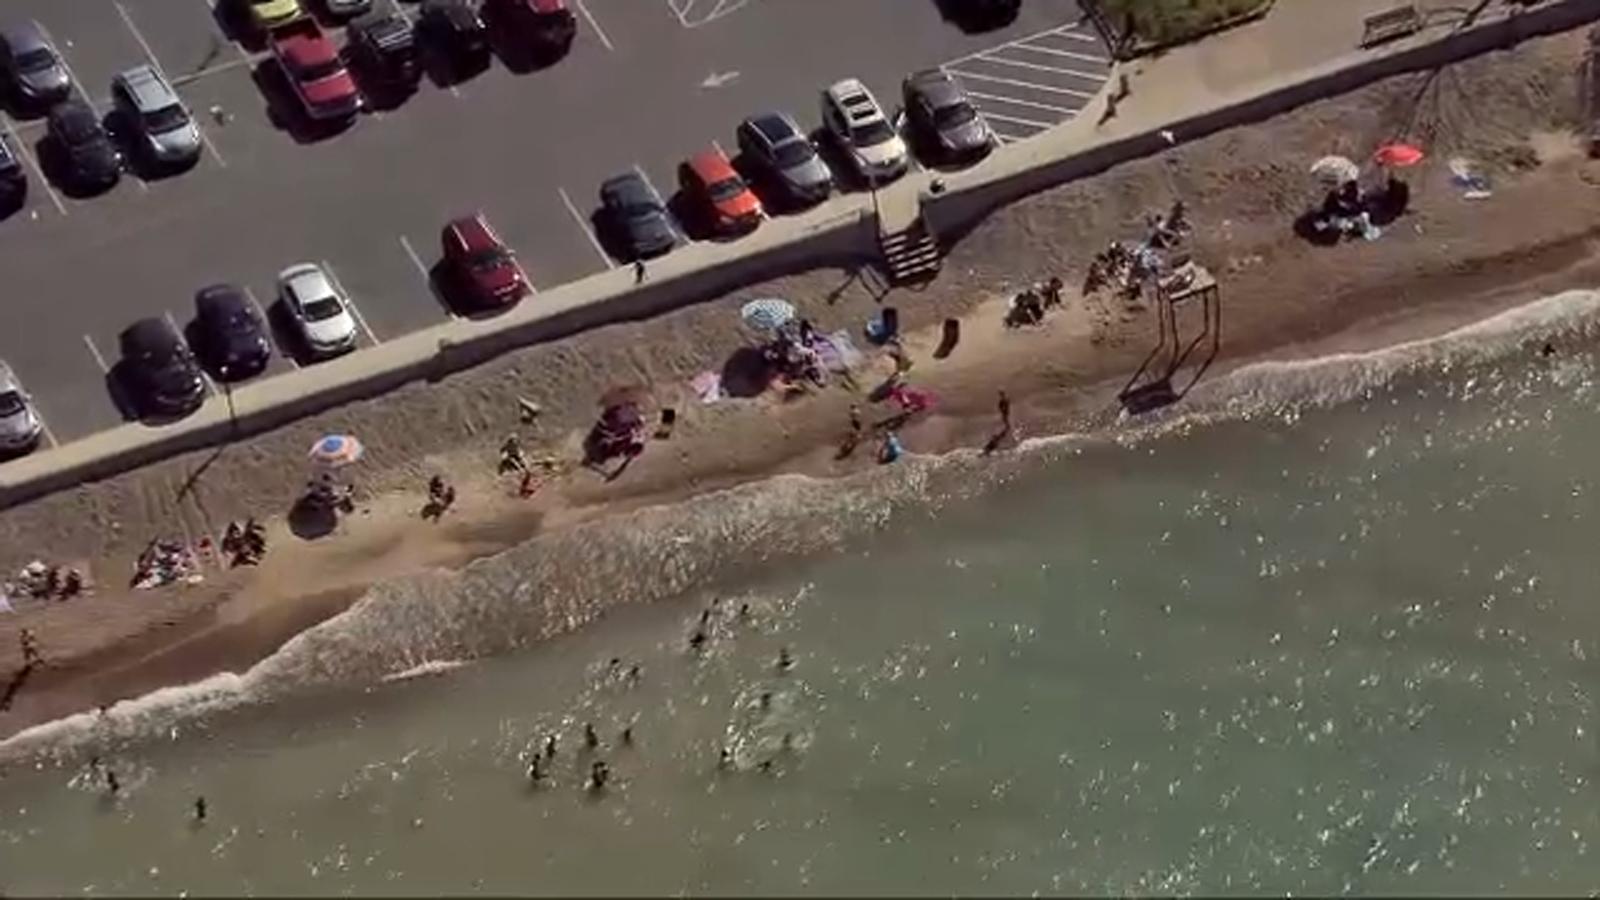 6316430 071420 wls whihala beach crowding img jpg?w=1600